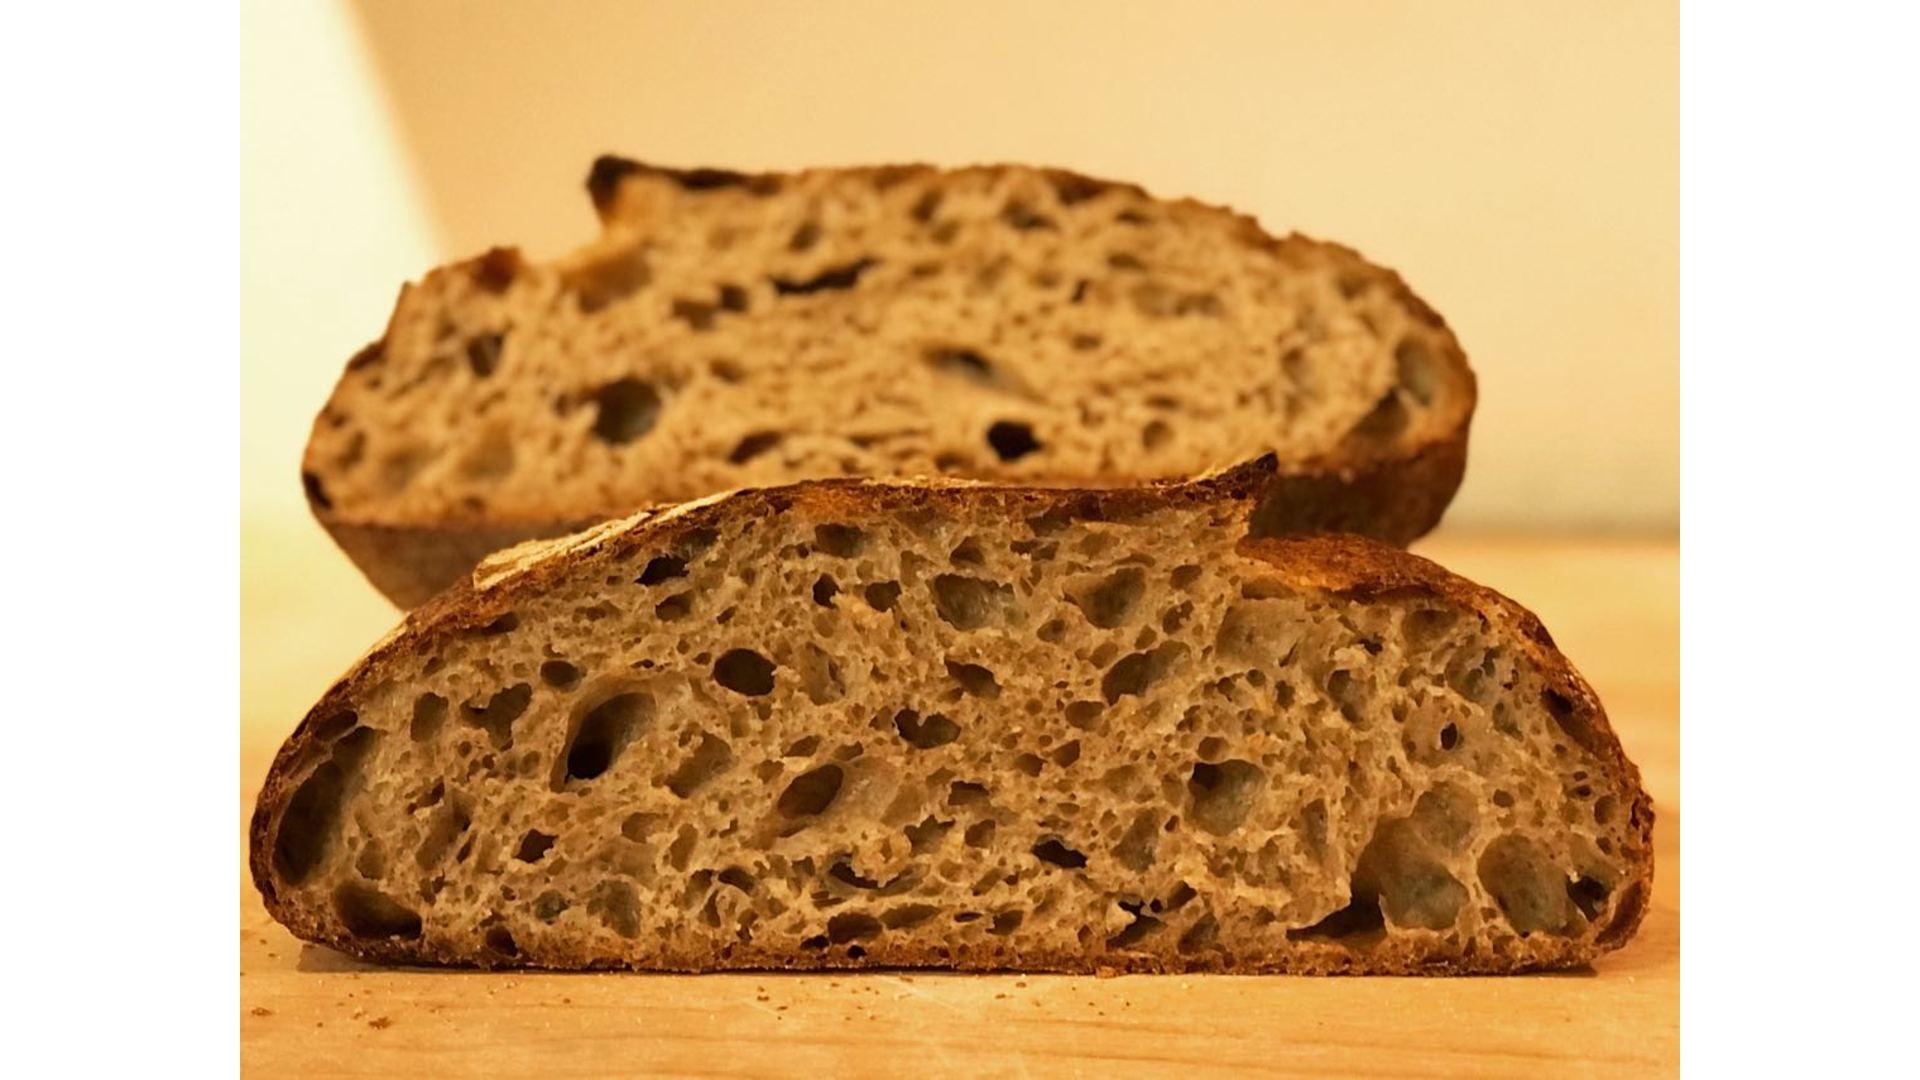 Peter Bakt Brood